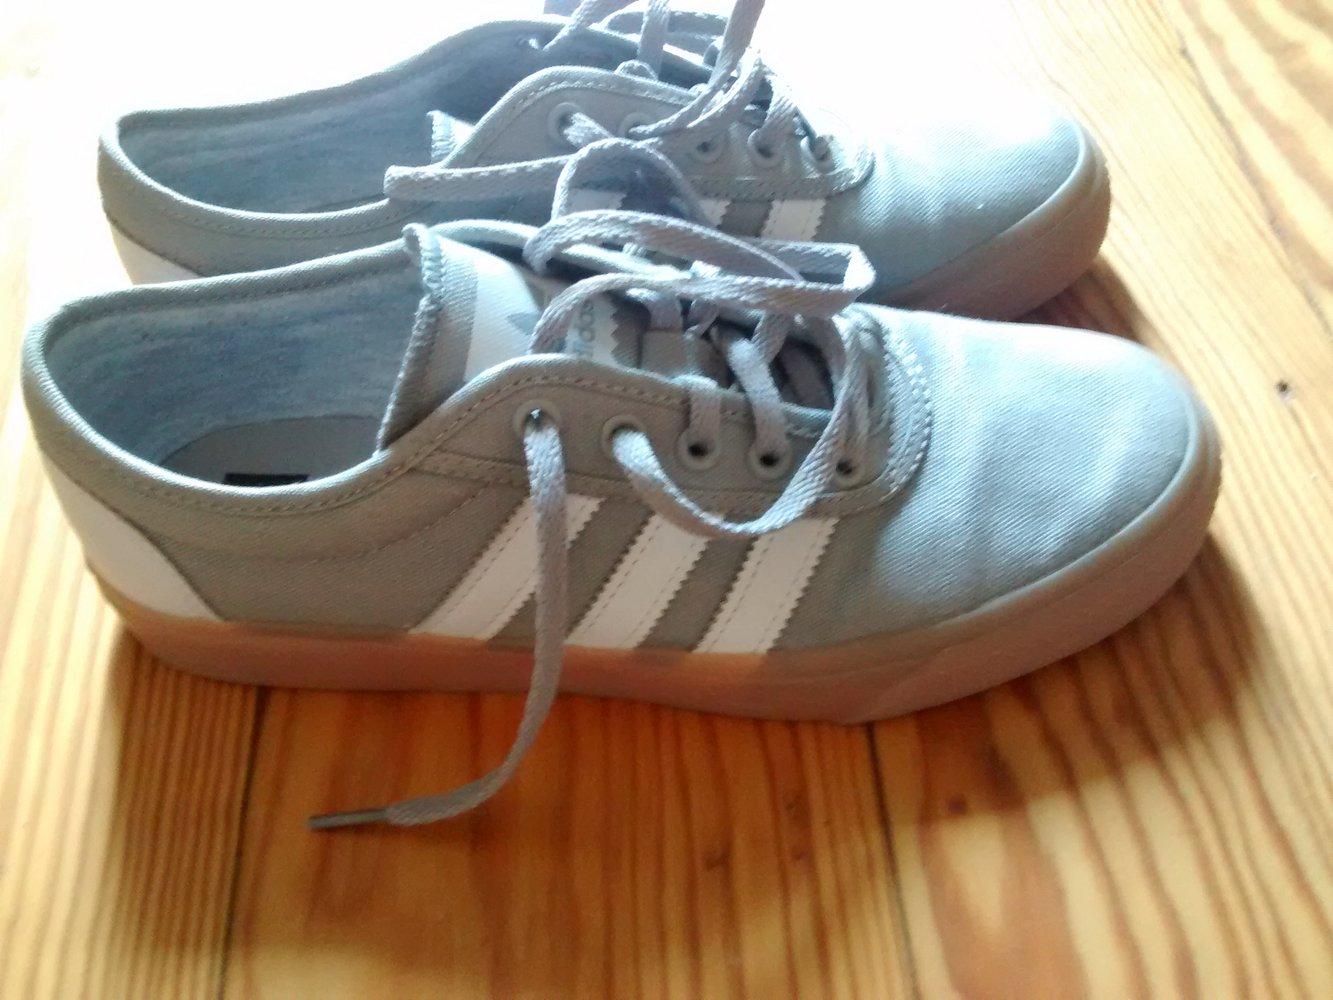 Adidas Sneaker Kleiderkorb at 40 Grau 5 Braune Sohle Us 7 aOwaW6qrFB